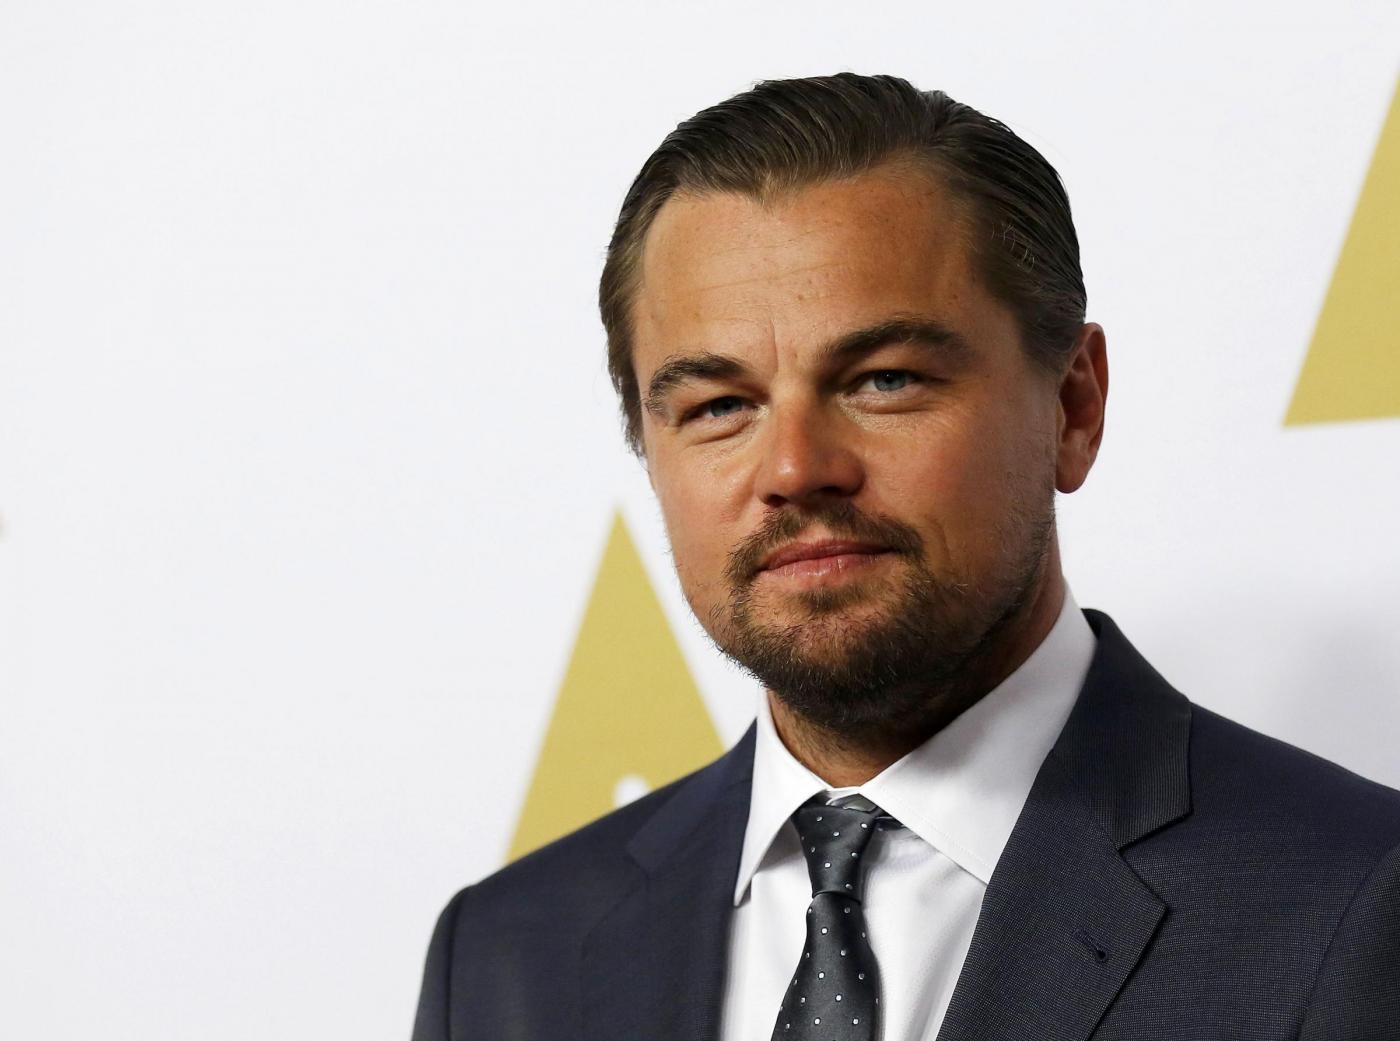 Oscar 2016 pronostici previsioni